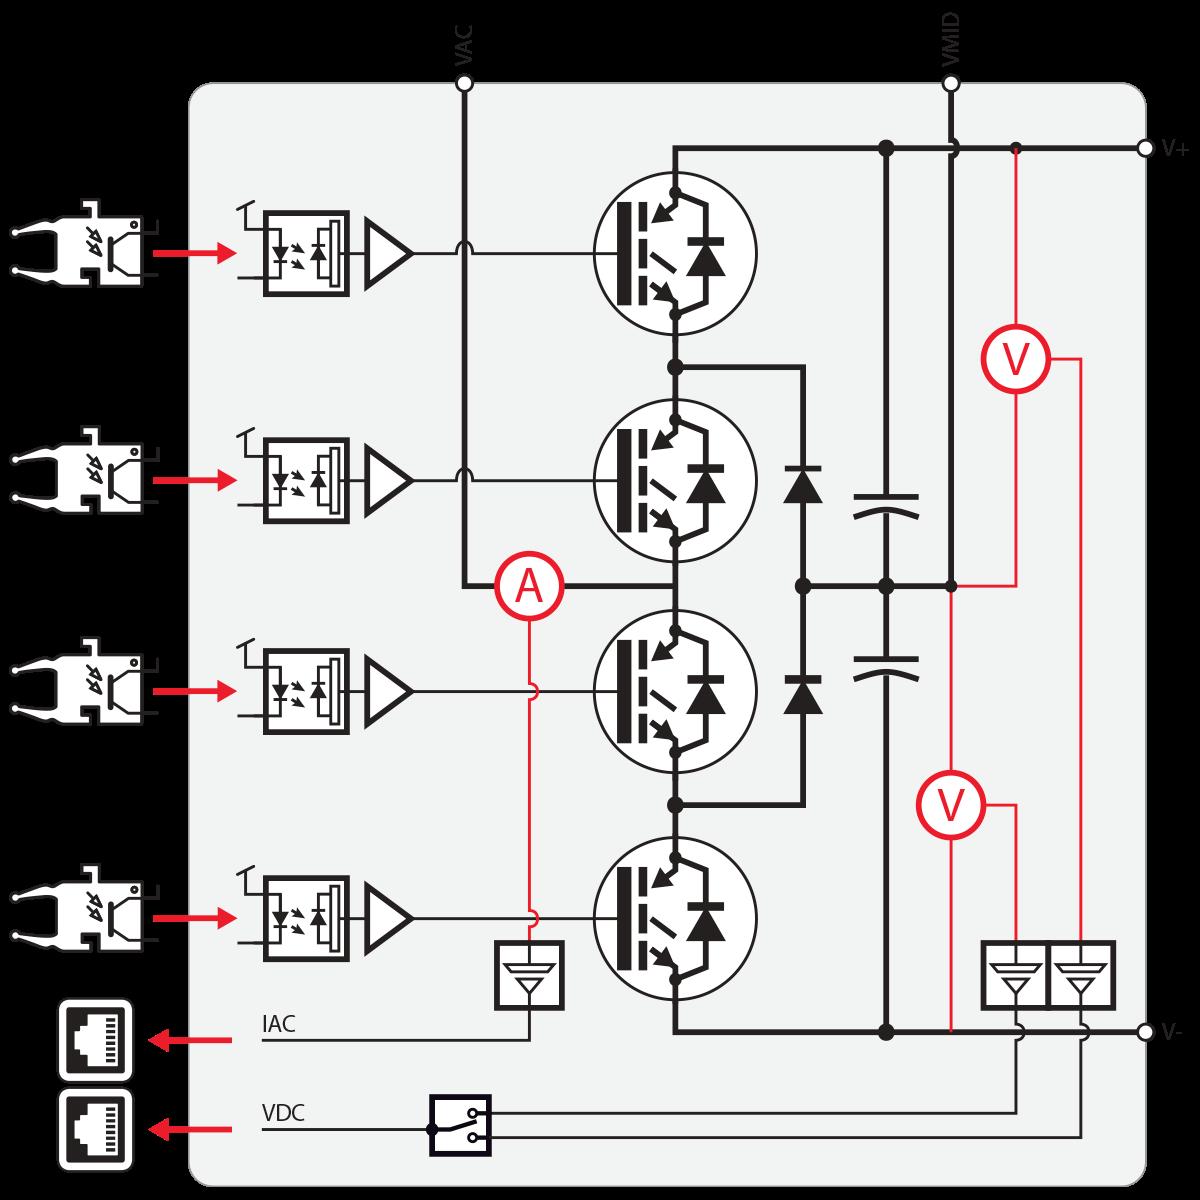 Electrical schematic of the PEN8018 NPC converter module.